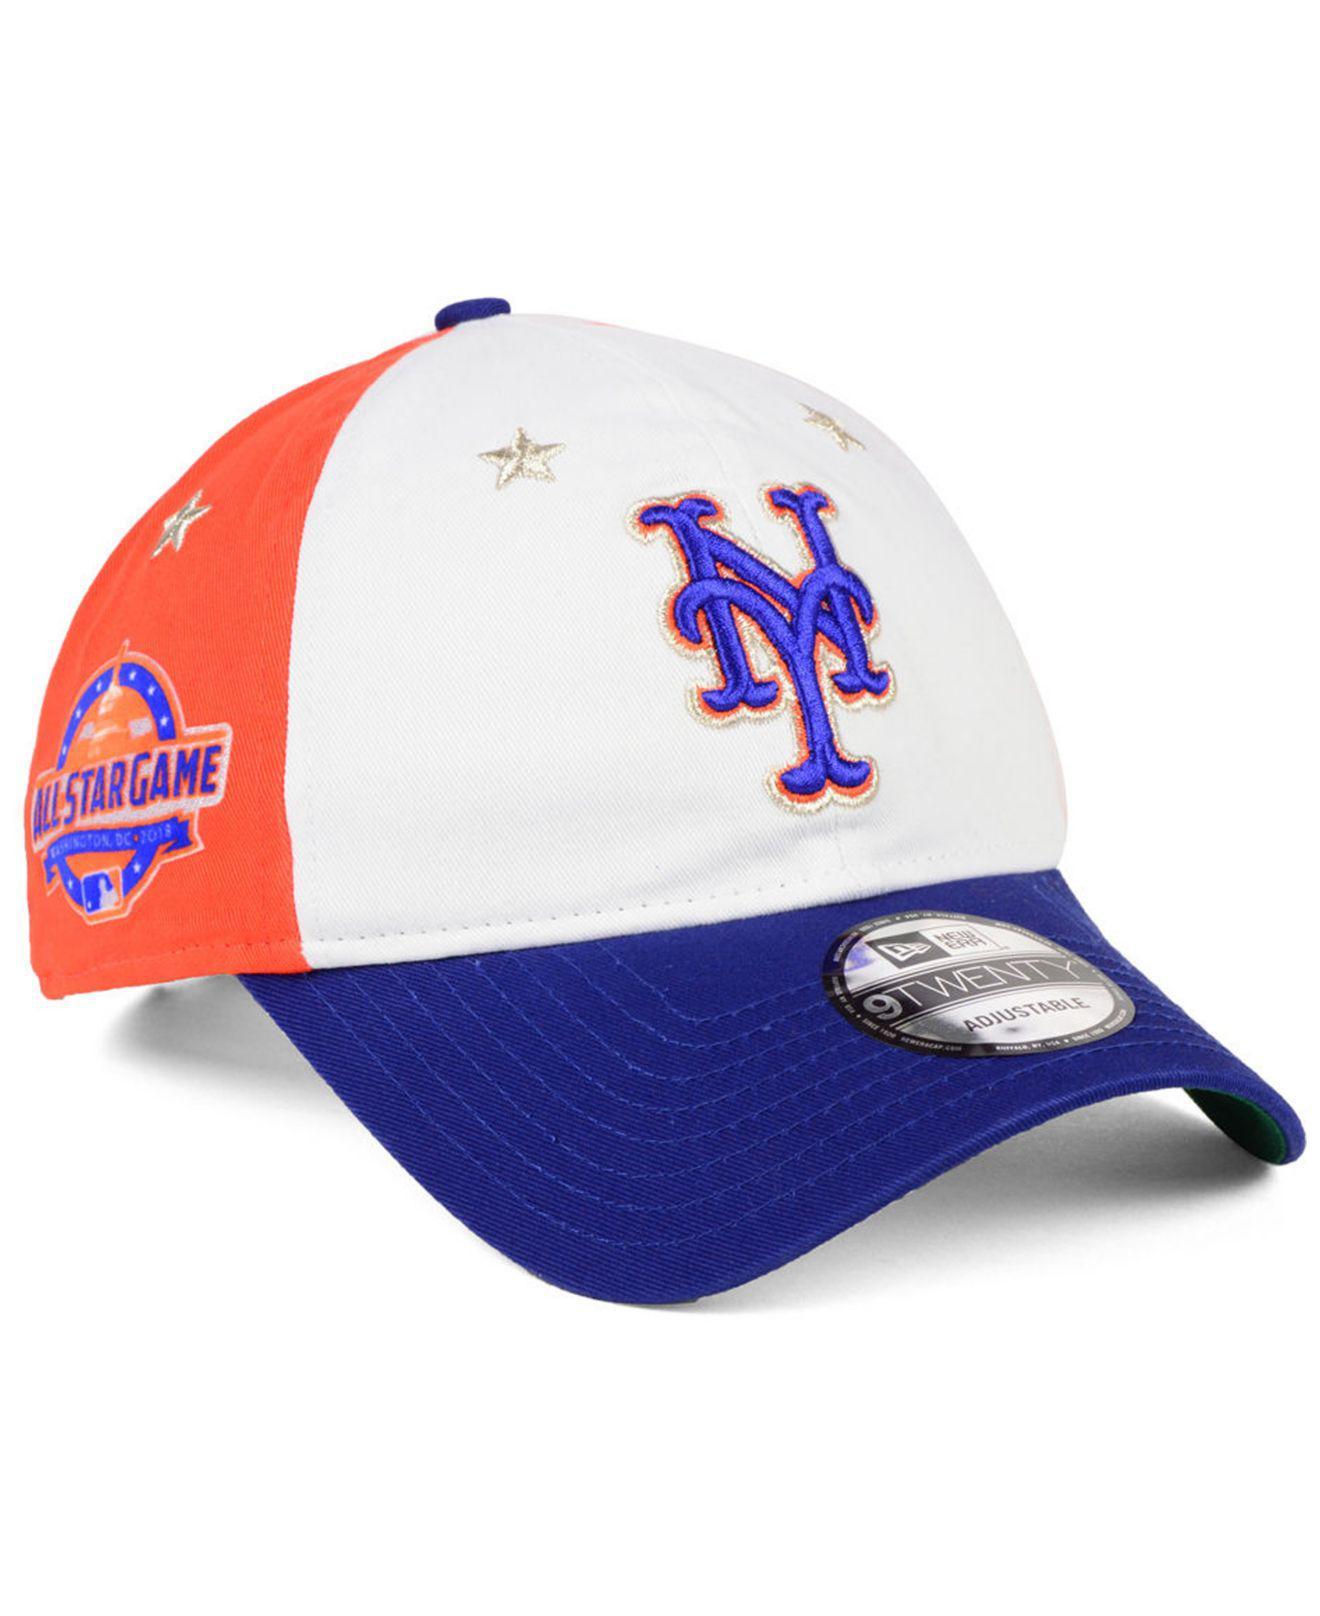 release date 12451 7aff7 KTZ. Men s New York Mets All Star Game 9twenty Strapback Cap 2018